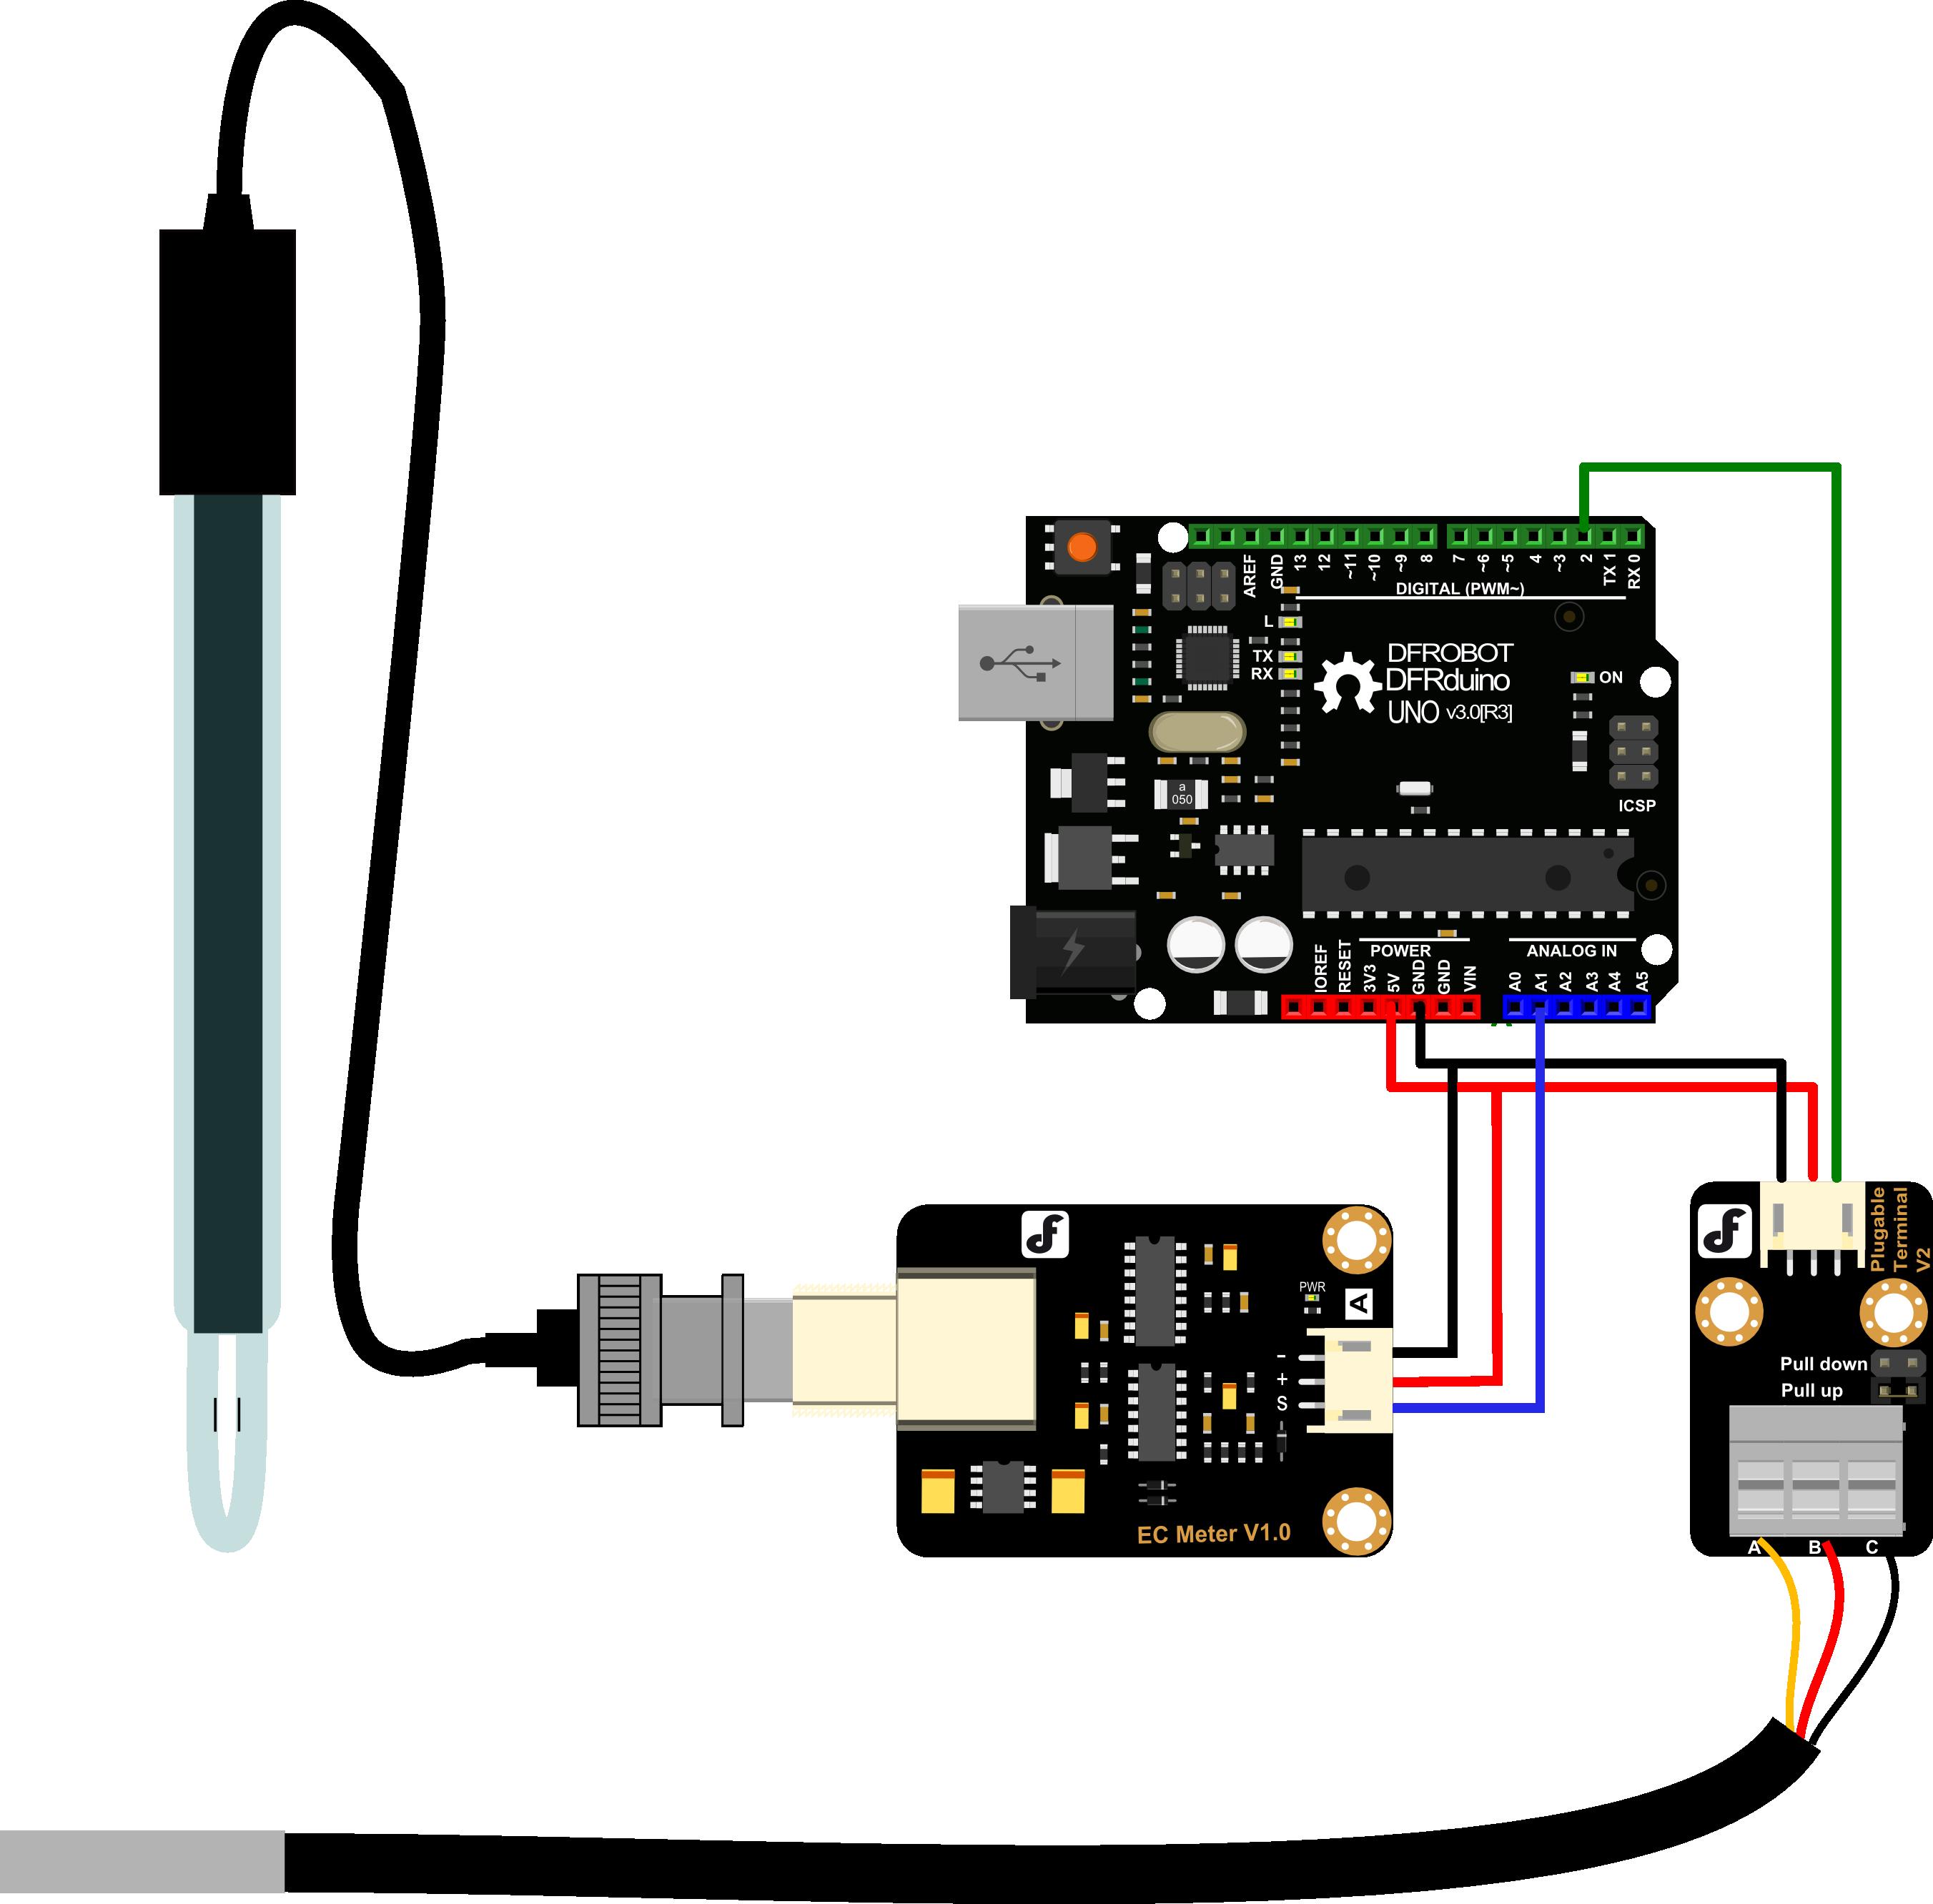 EC_Meter_Sys.png